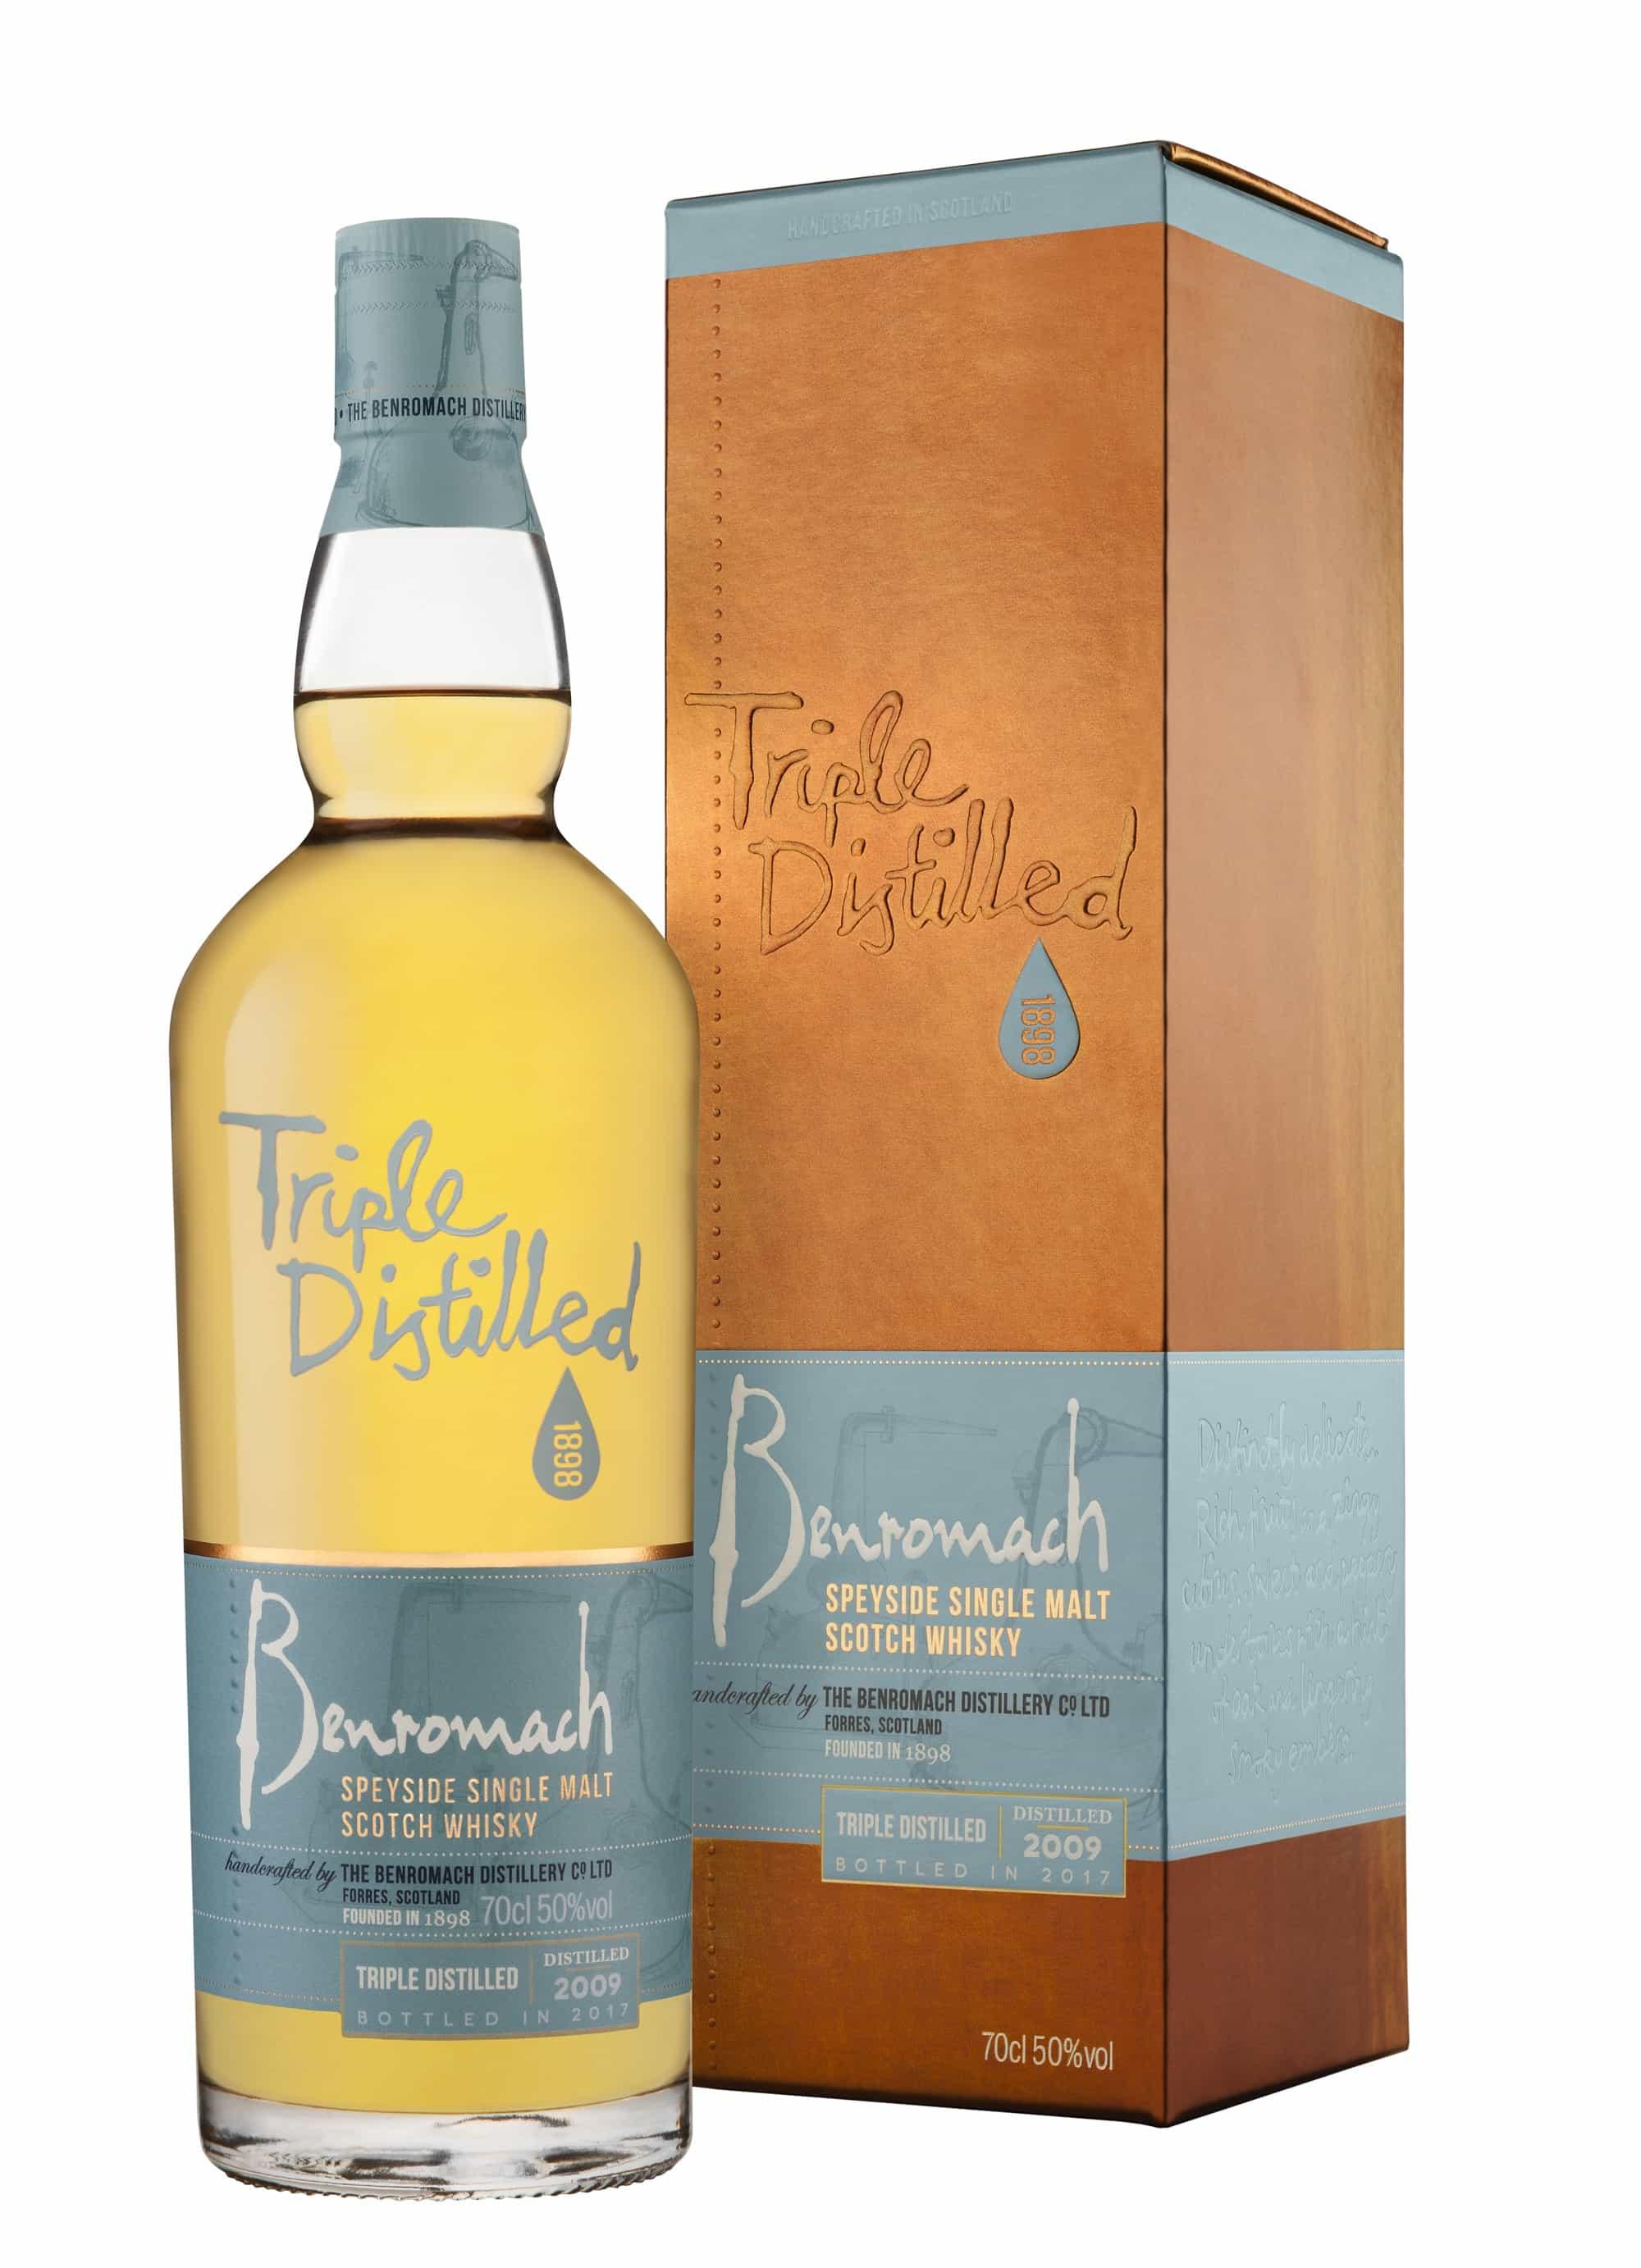 Benromach Triple Distilled